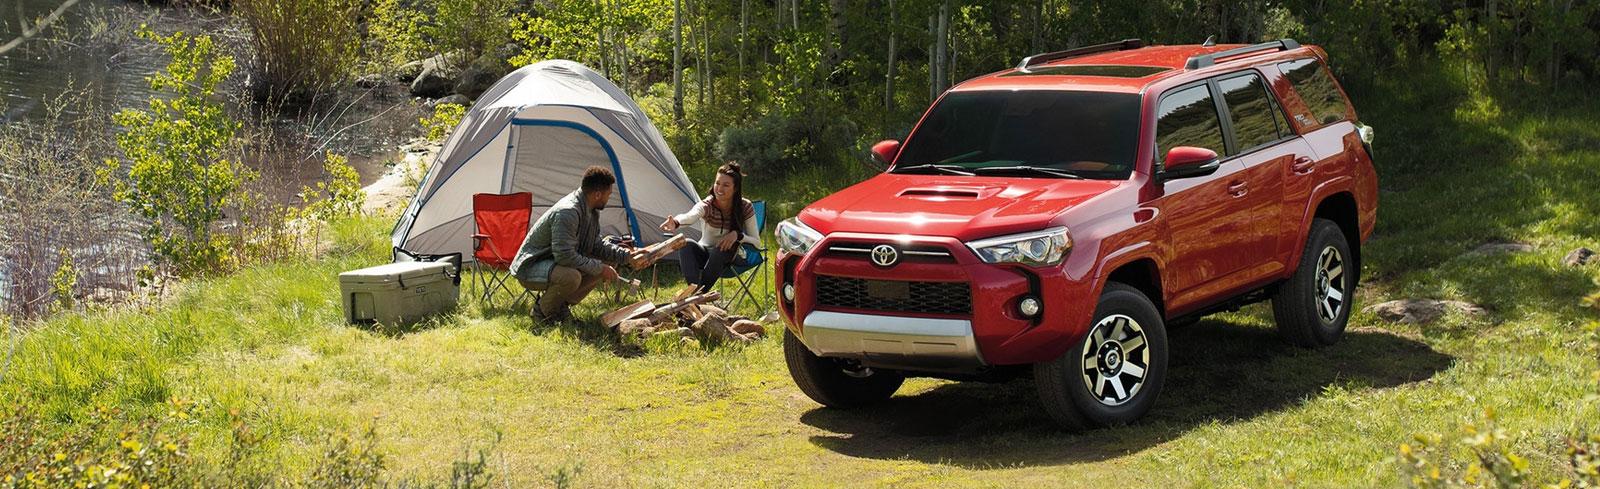 2020 Toyota 4Runner SUV in Oklahoma City, near Edmond, OK